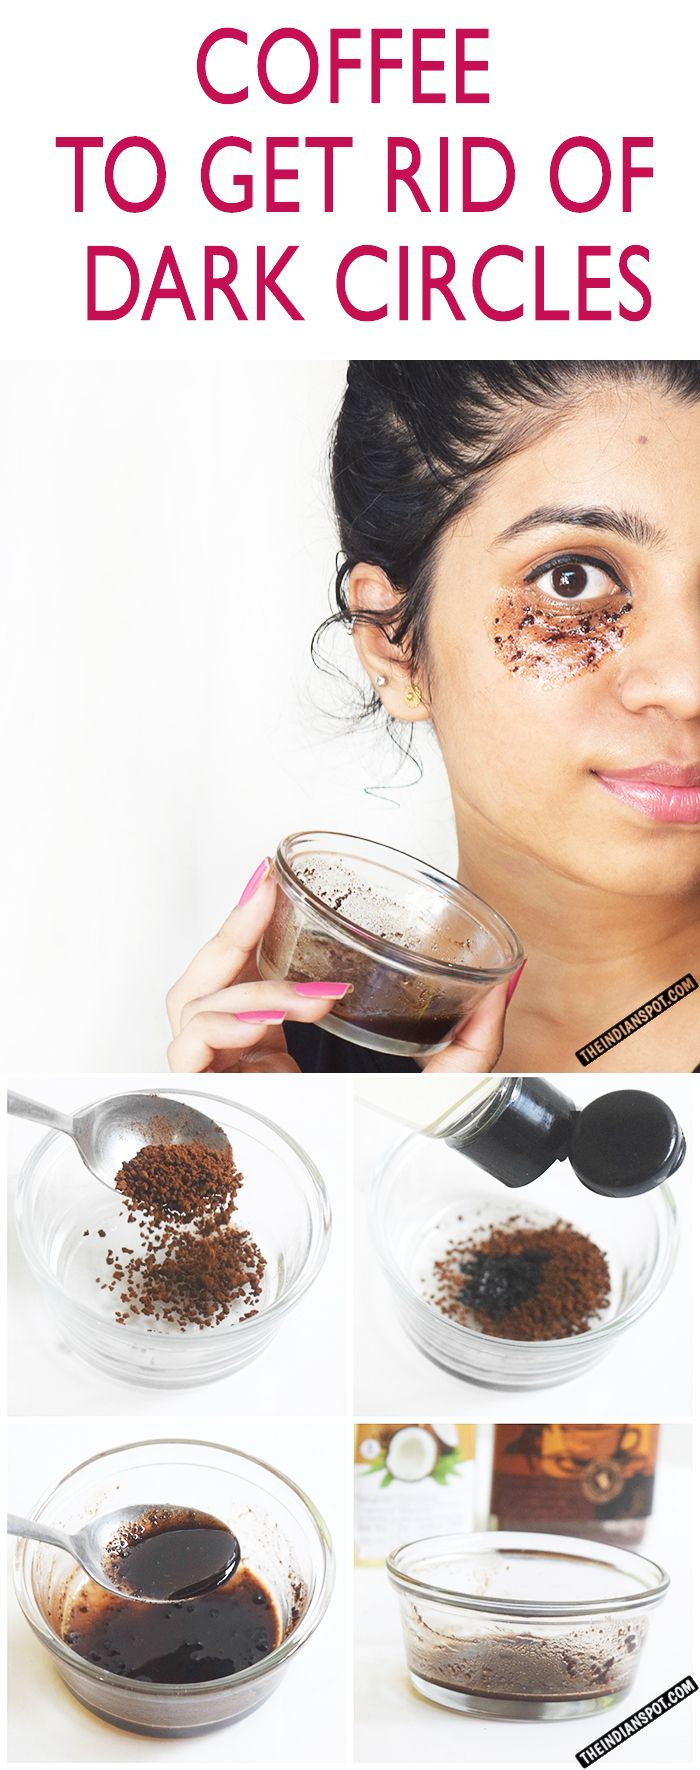 2 tbsp of coffee beans + 2tbsp of coconut oil. Apply under eyes. Masage 3-4 min.